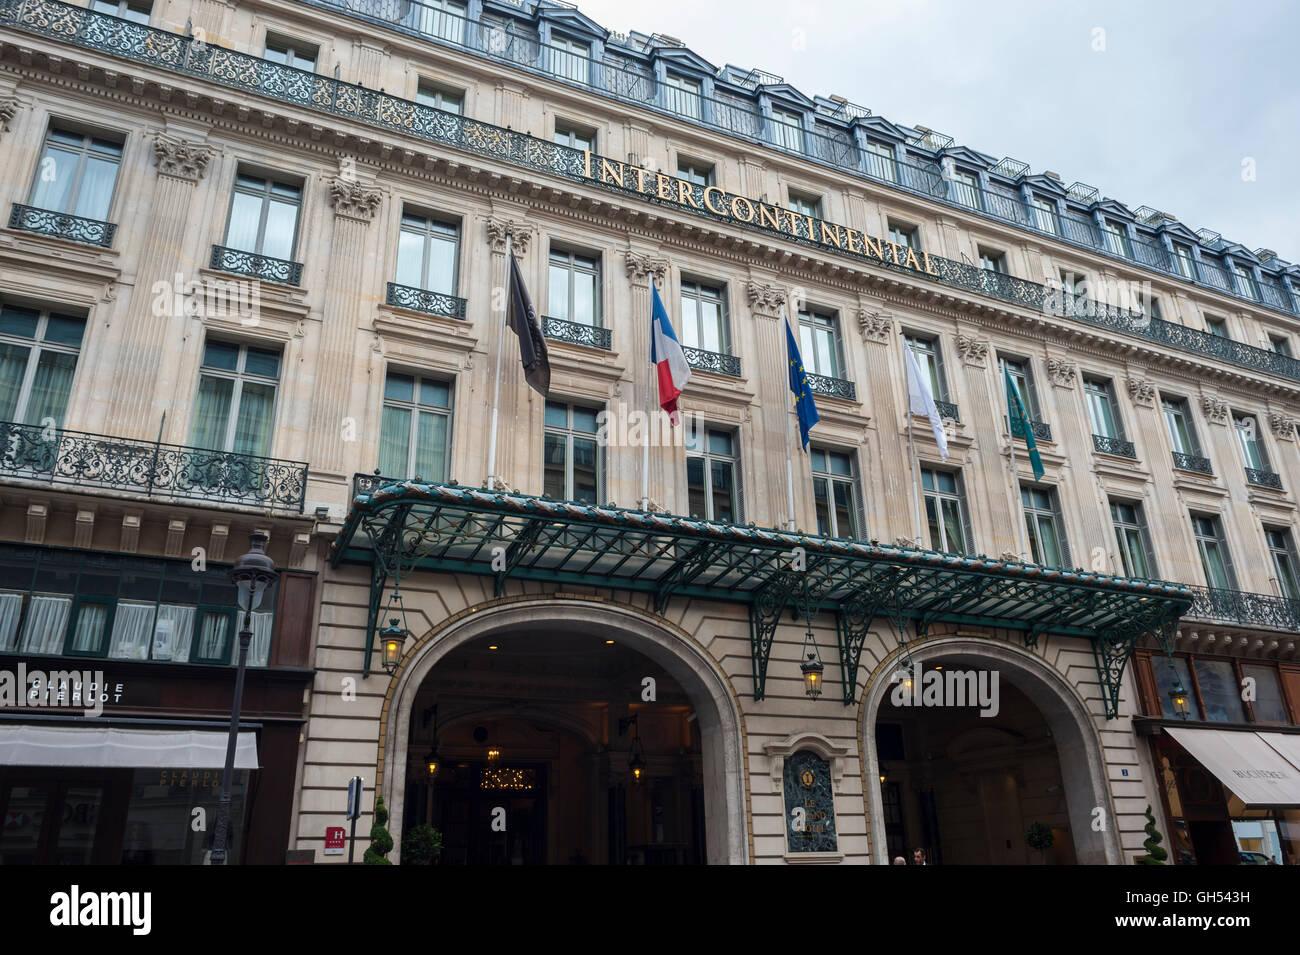 Paris France Exterior Facade Front 5 Star Hotel Entrance Luxury